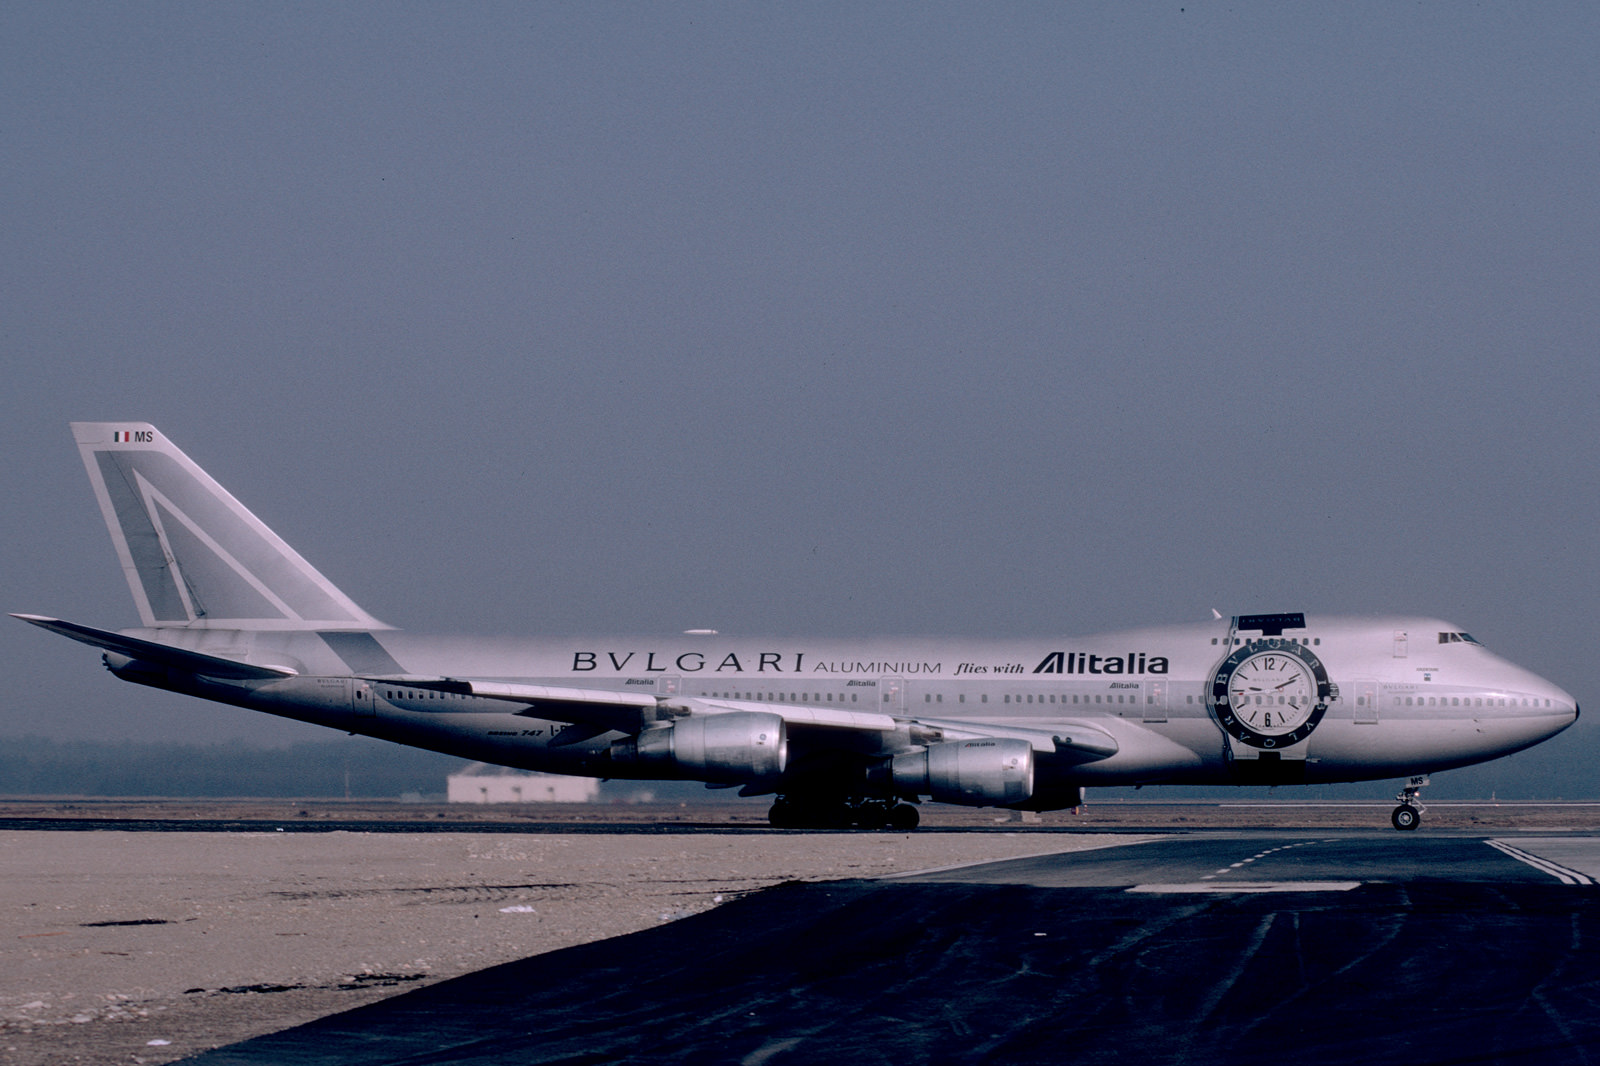 Avión de Alitalia con el Bulgari Aluminium